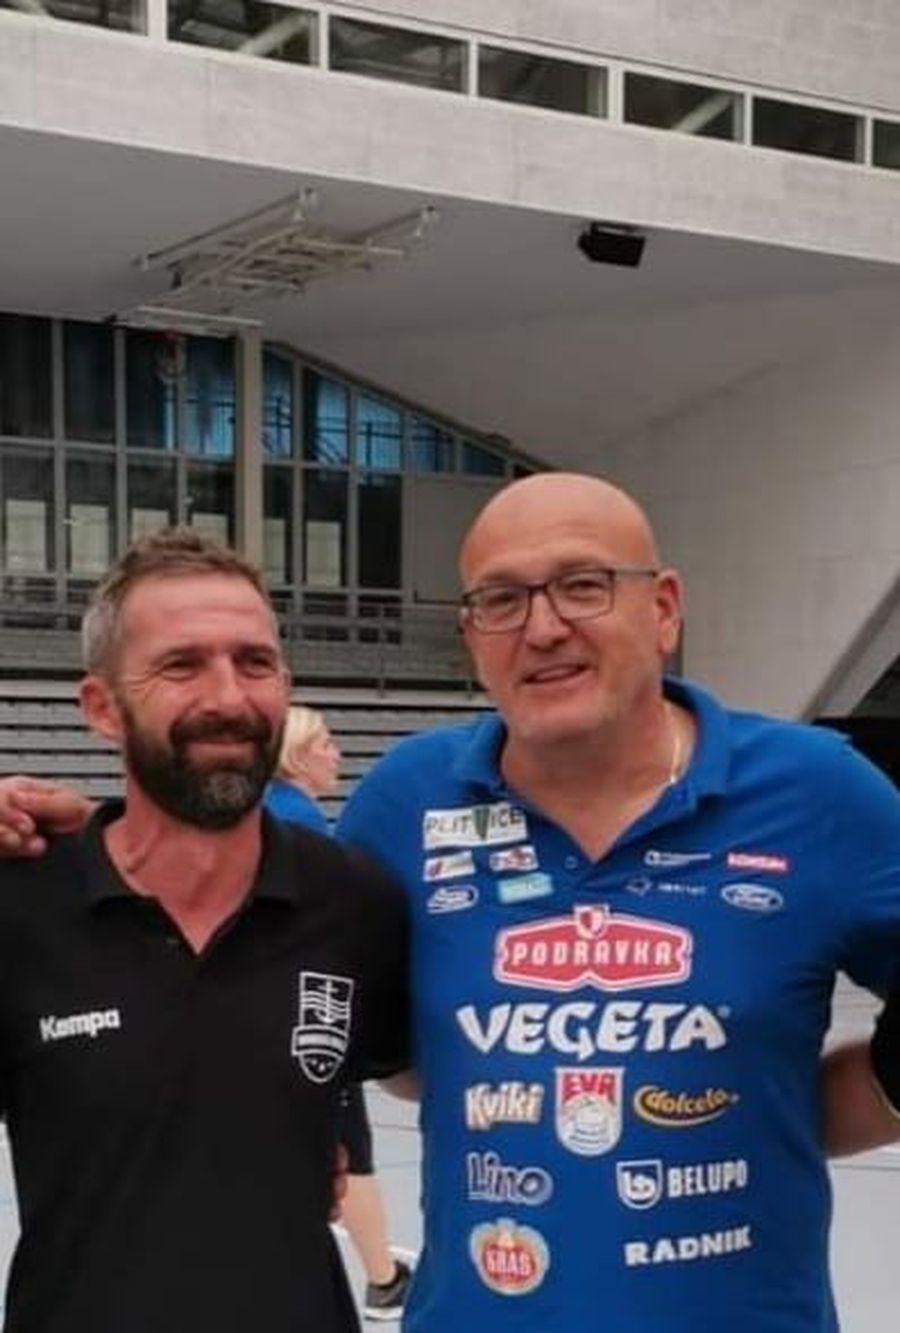 Neven Hrupec și Zlatko Saracevic